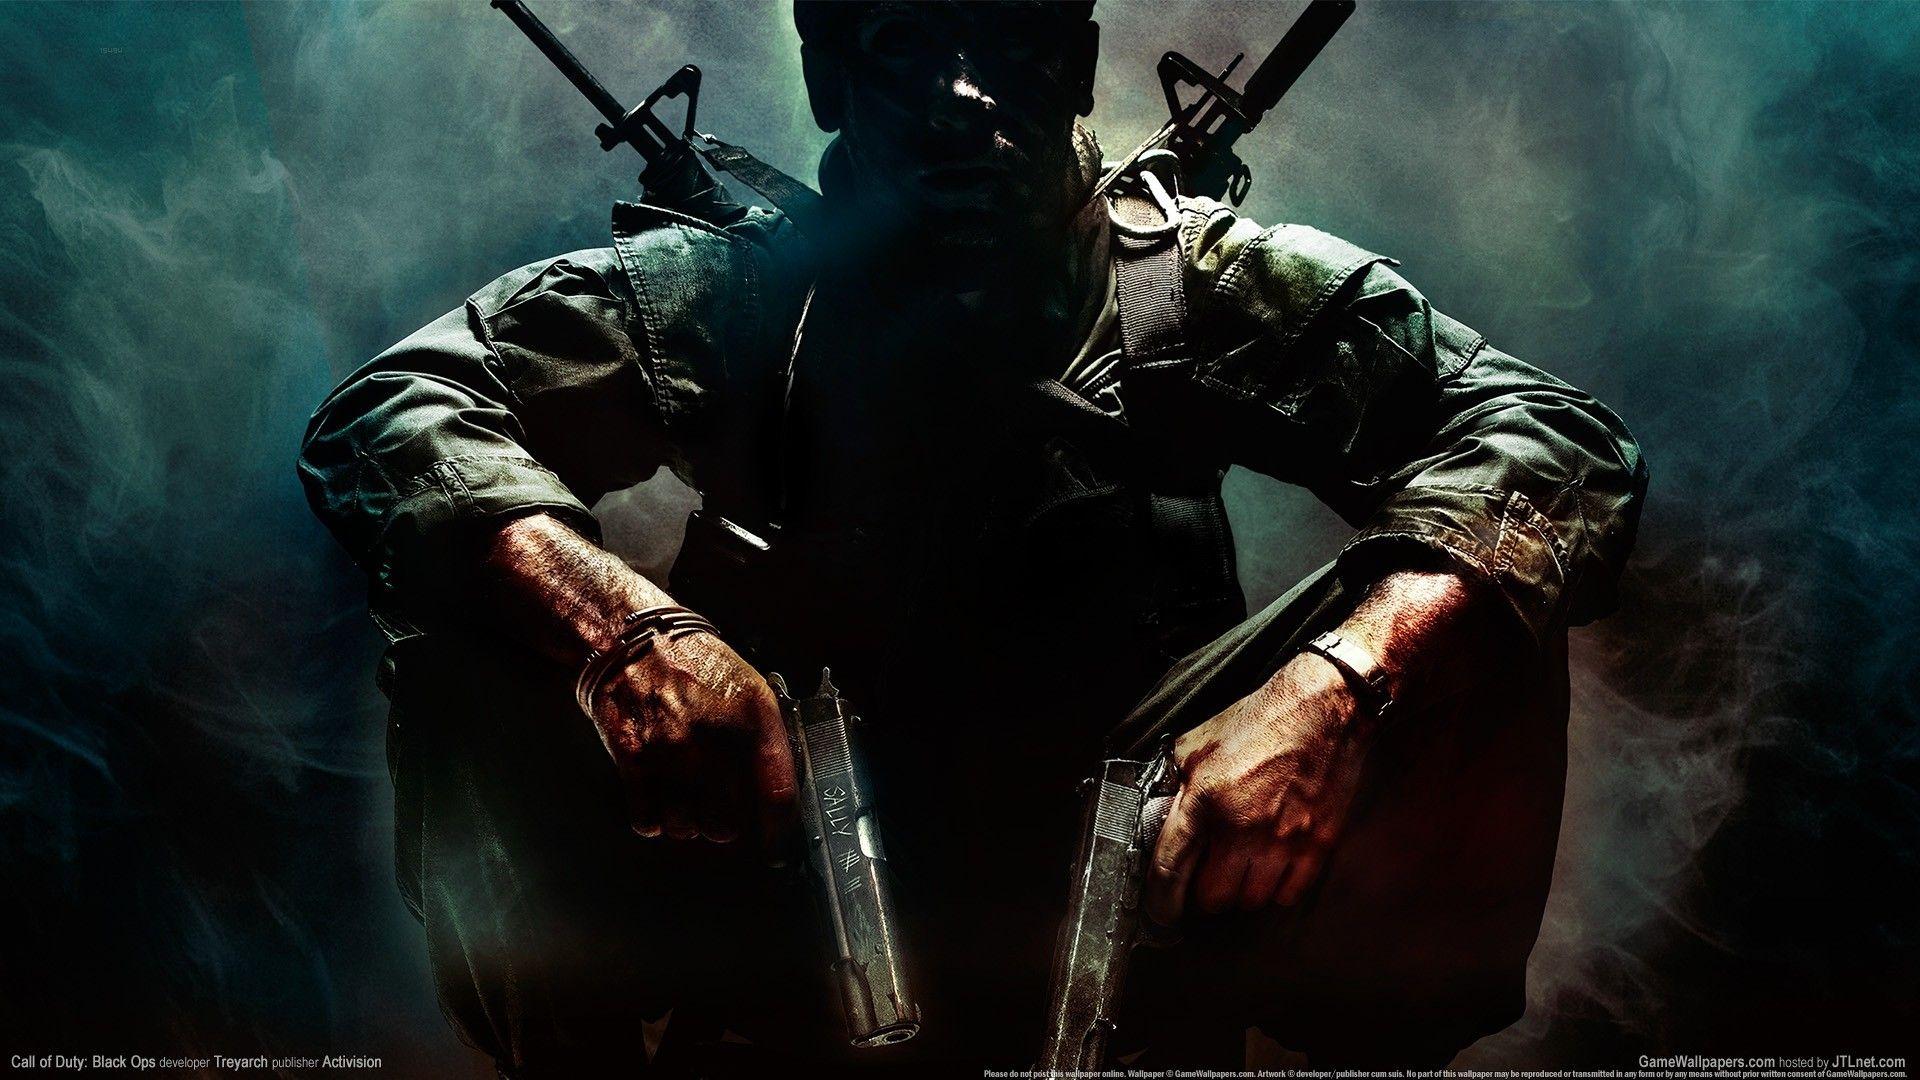 Black Ops Call Of Duty Black Ops Wallpaper Black Ops